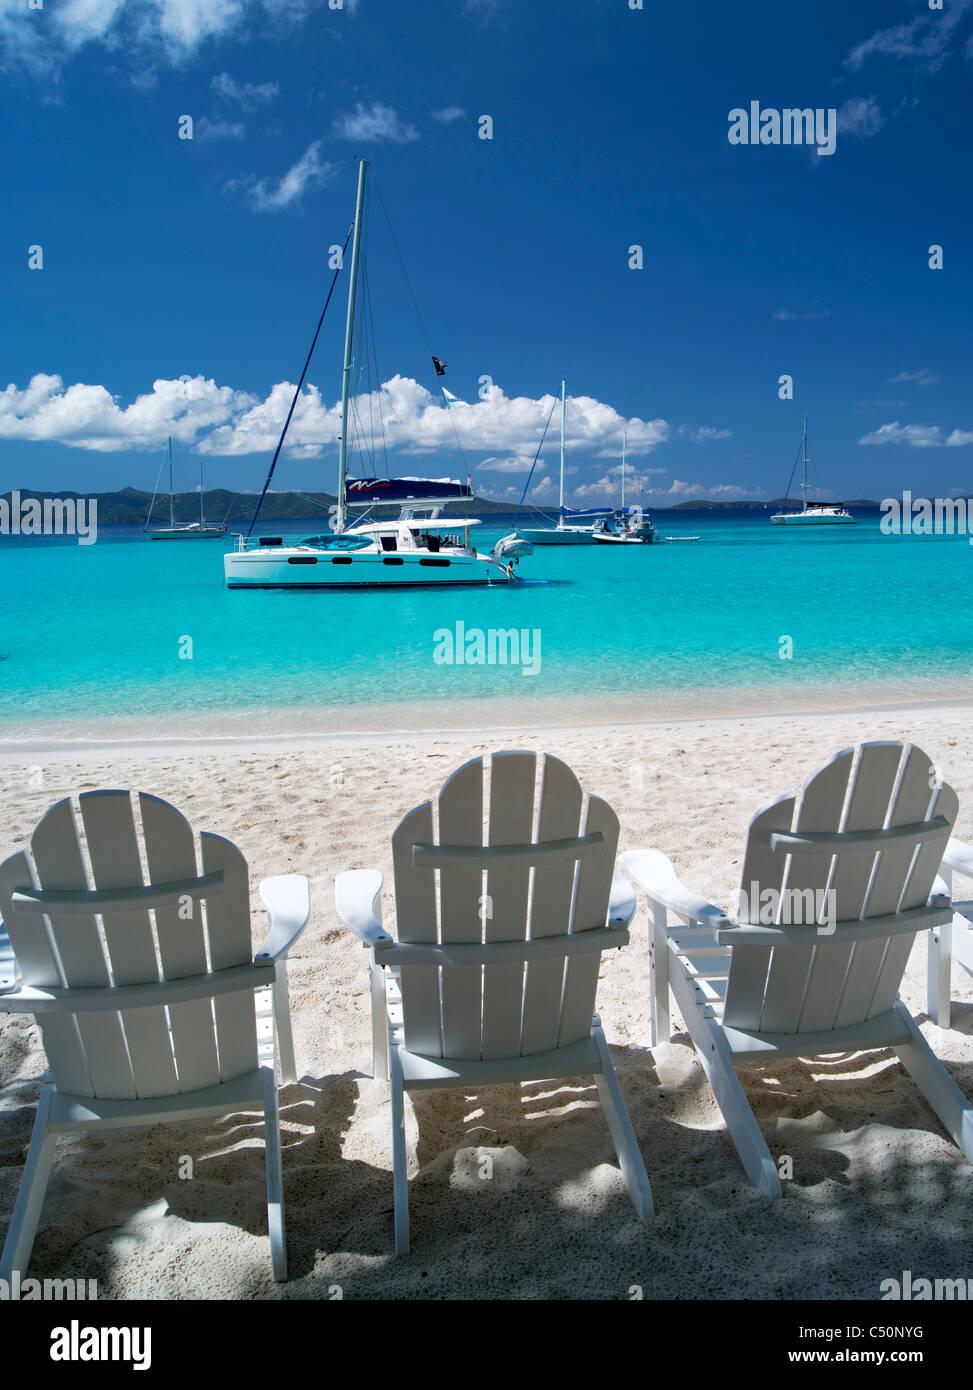 Adirondack chair boats and beach. Jost Van Dyke. British Virgin Islands - Stock Image